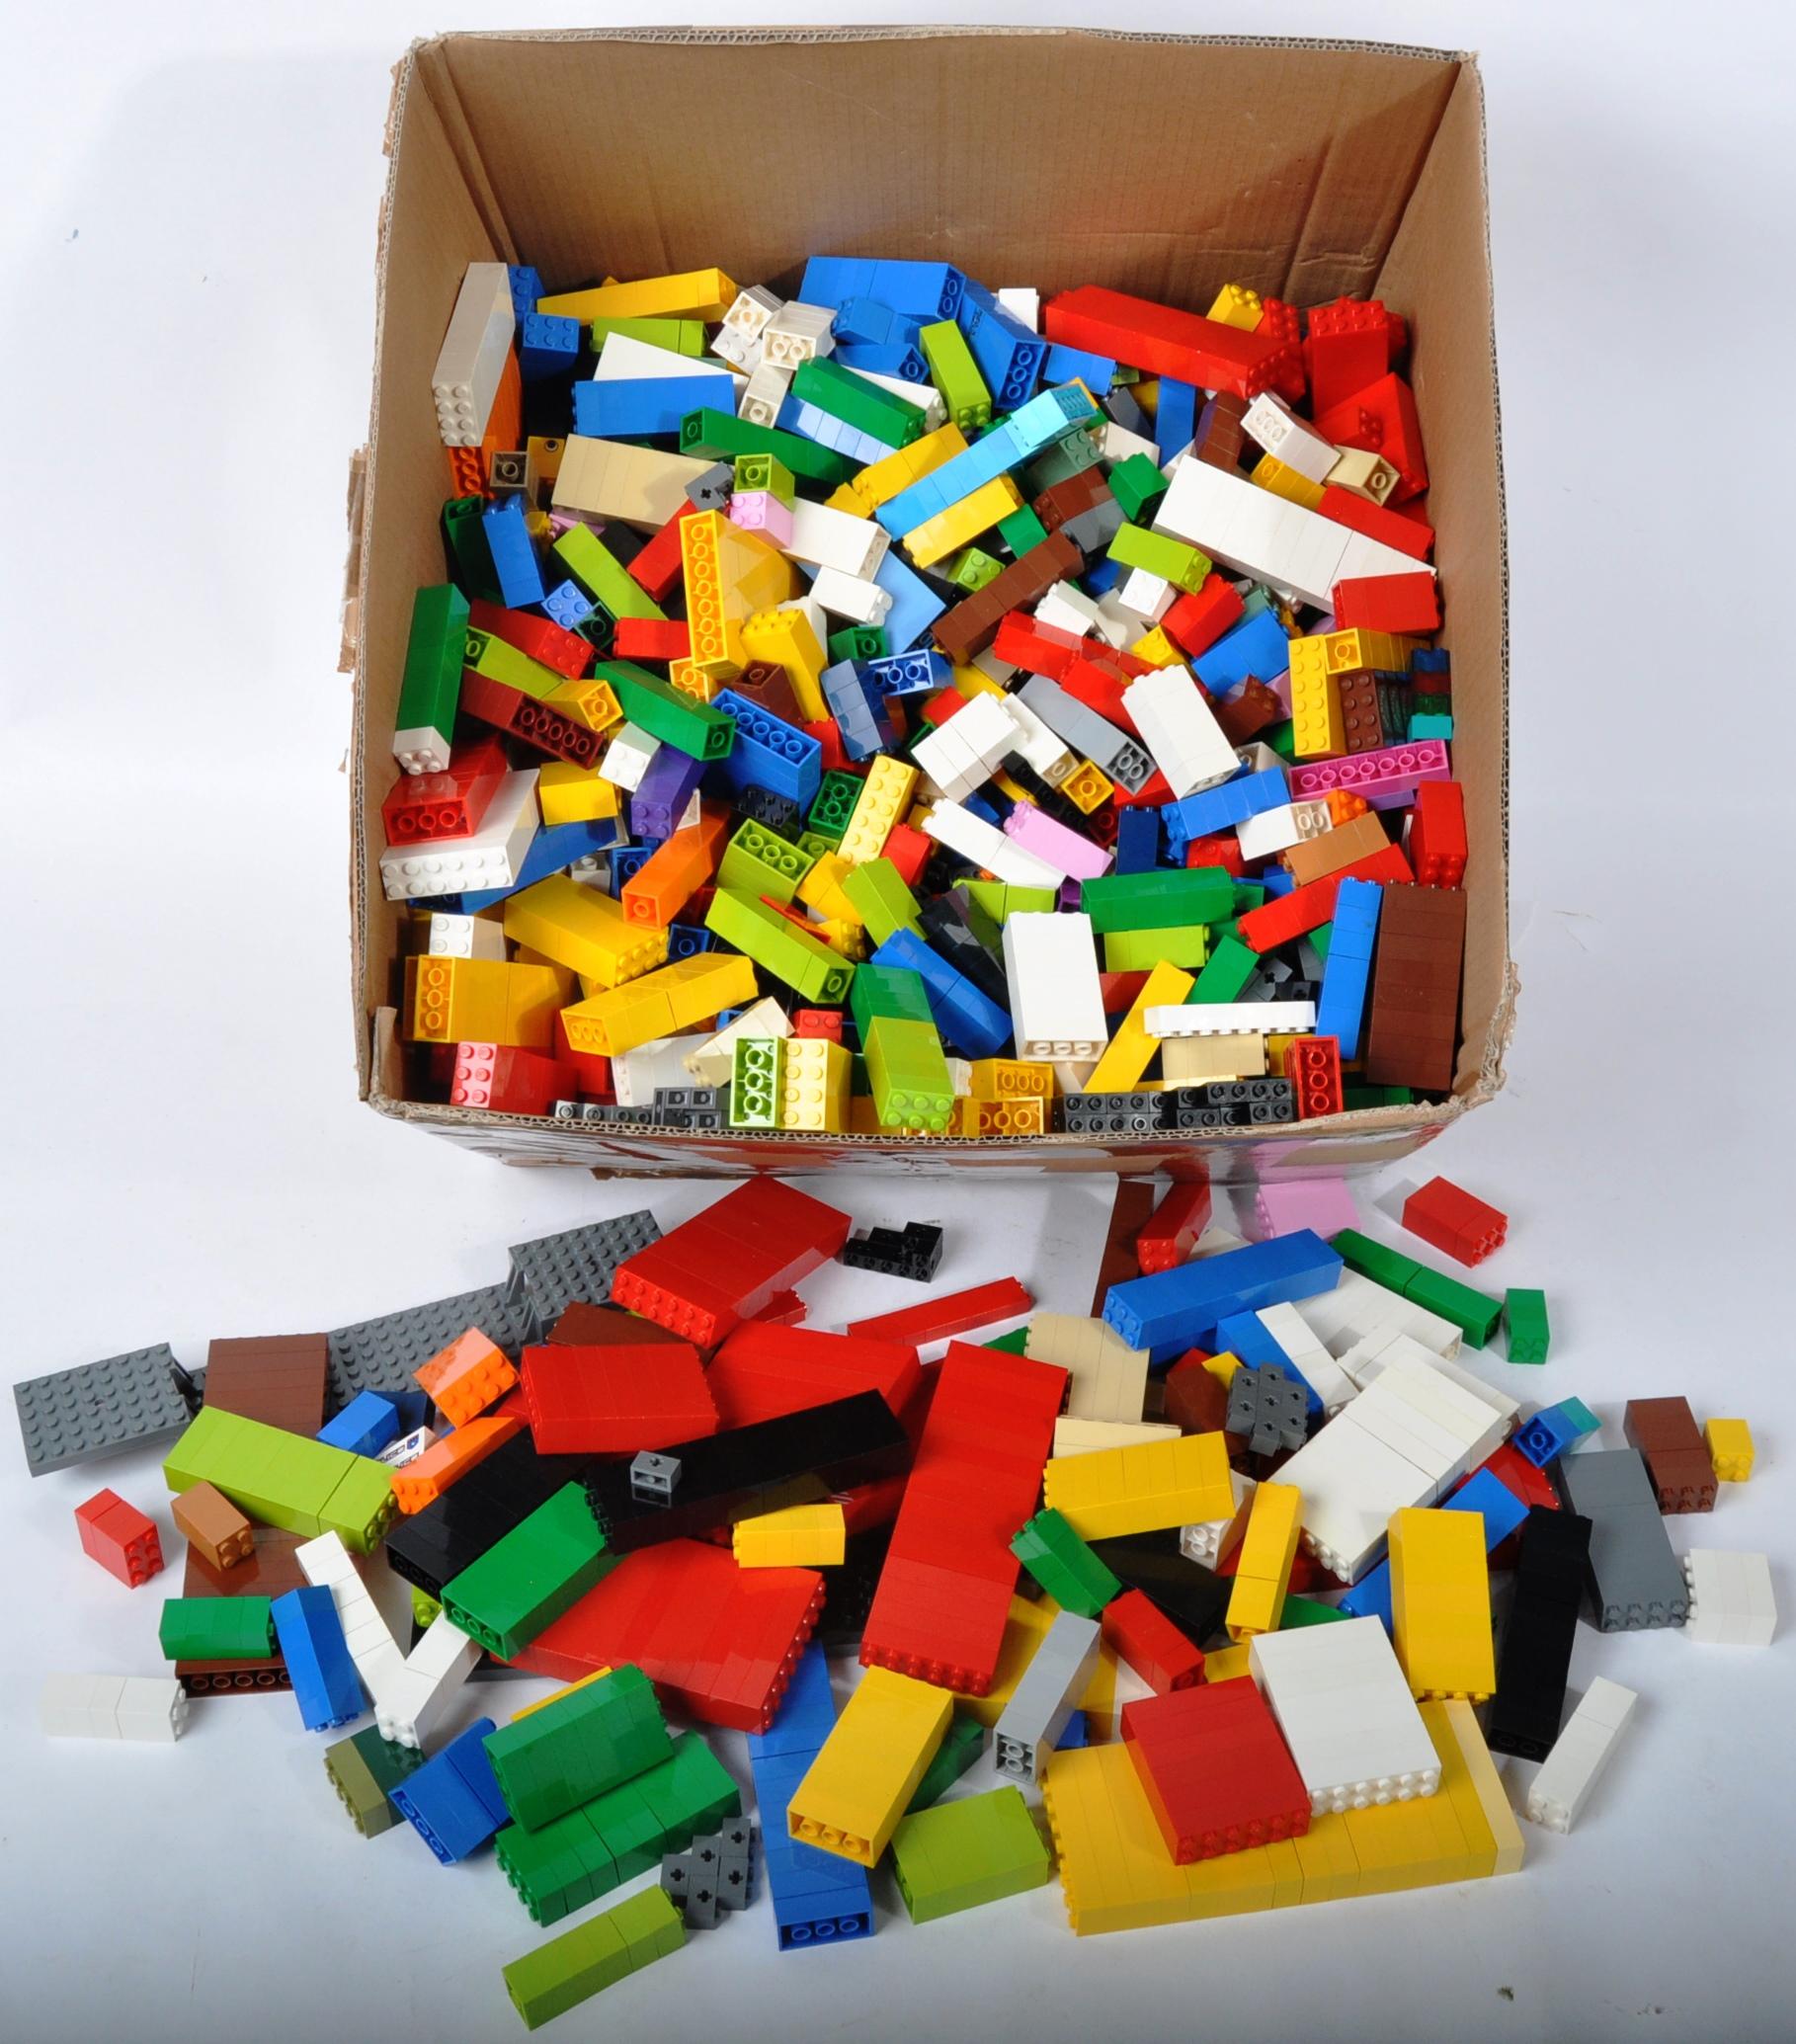 LARGE ASSORTMENT OF LOOSE LEGO BRICKS